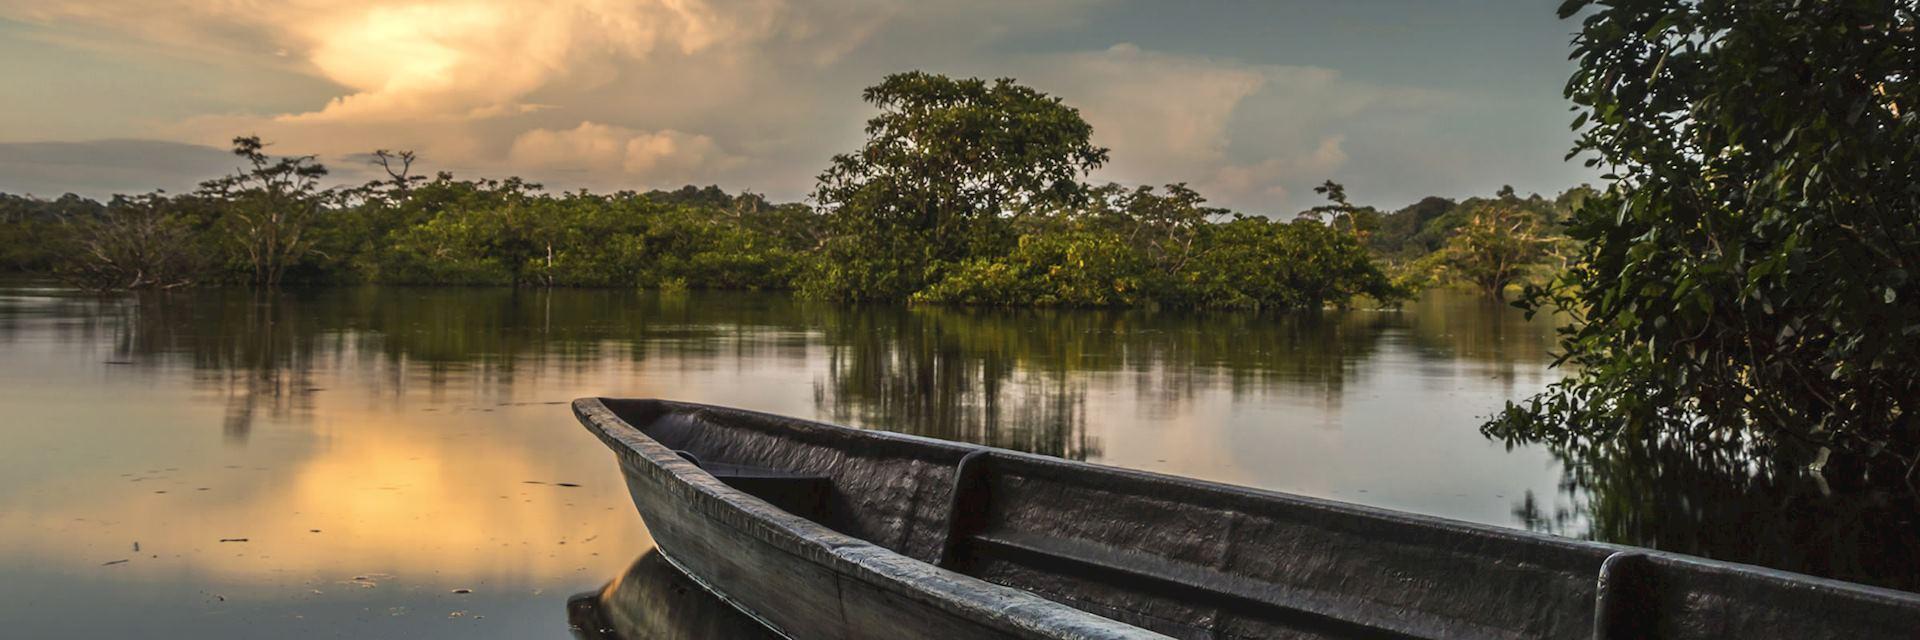 The Amazonian rainforest in Ecuador